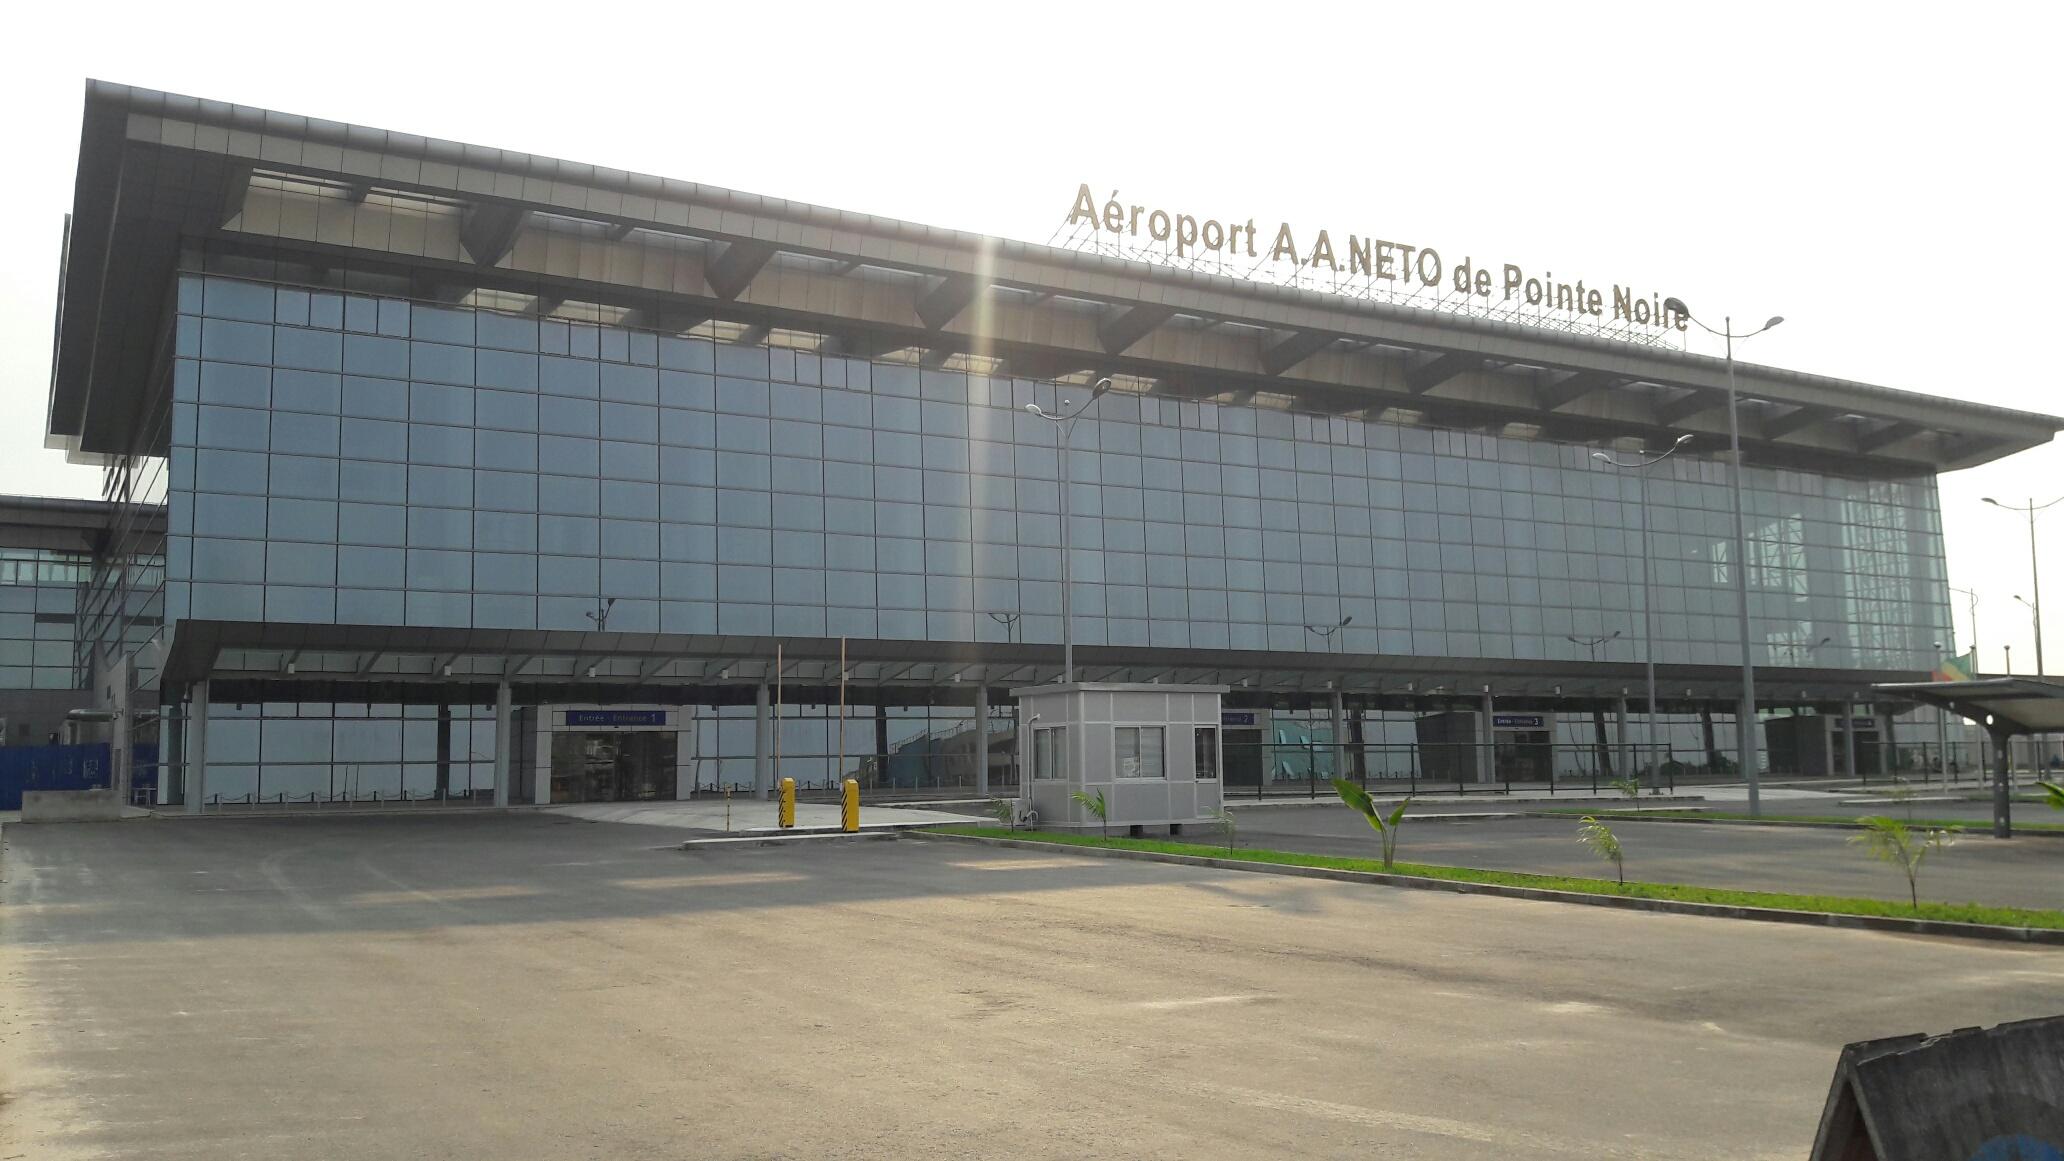 Galerie photos - Aéroport International Agostinho Neto Pointe-Noire